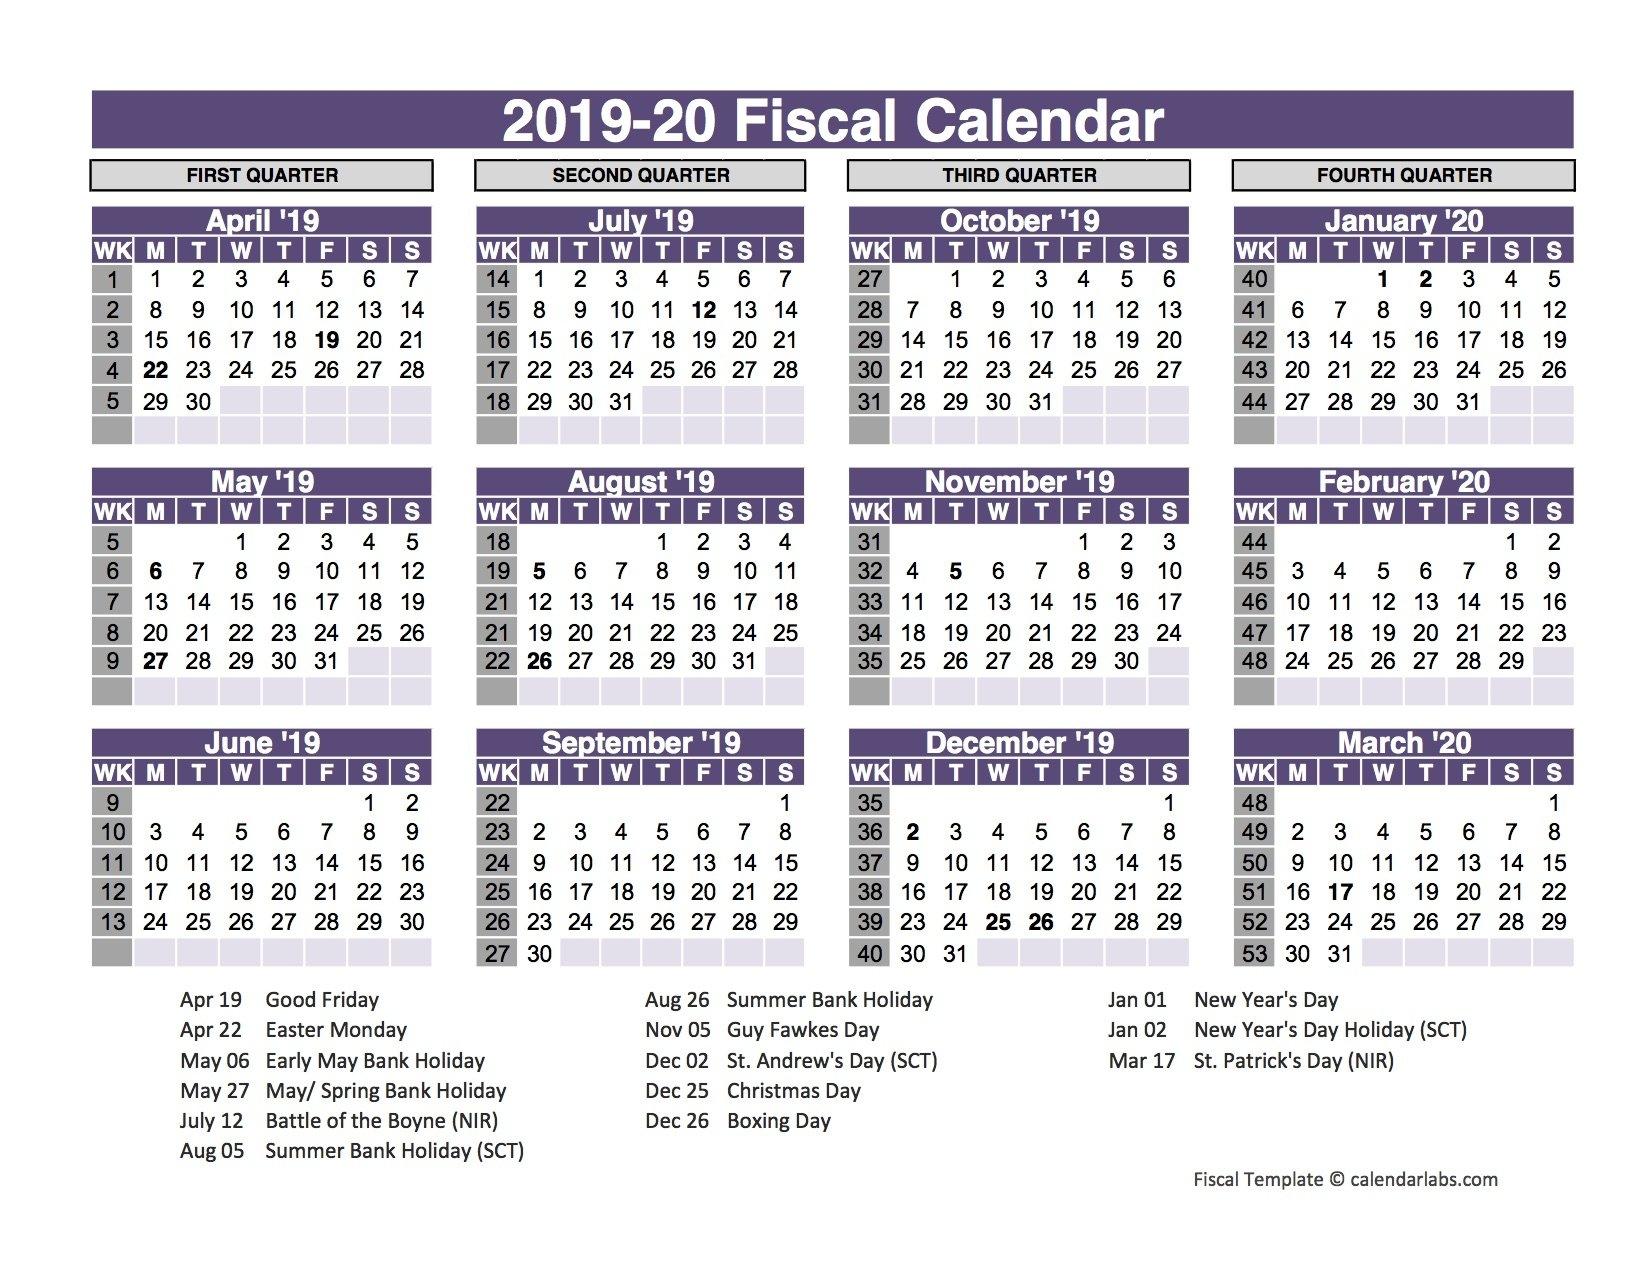 2019 Template Fiscal Year 4–4–5 Calendar | Www.picsbud 4 4 5 Calendar 2019